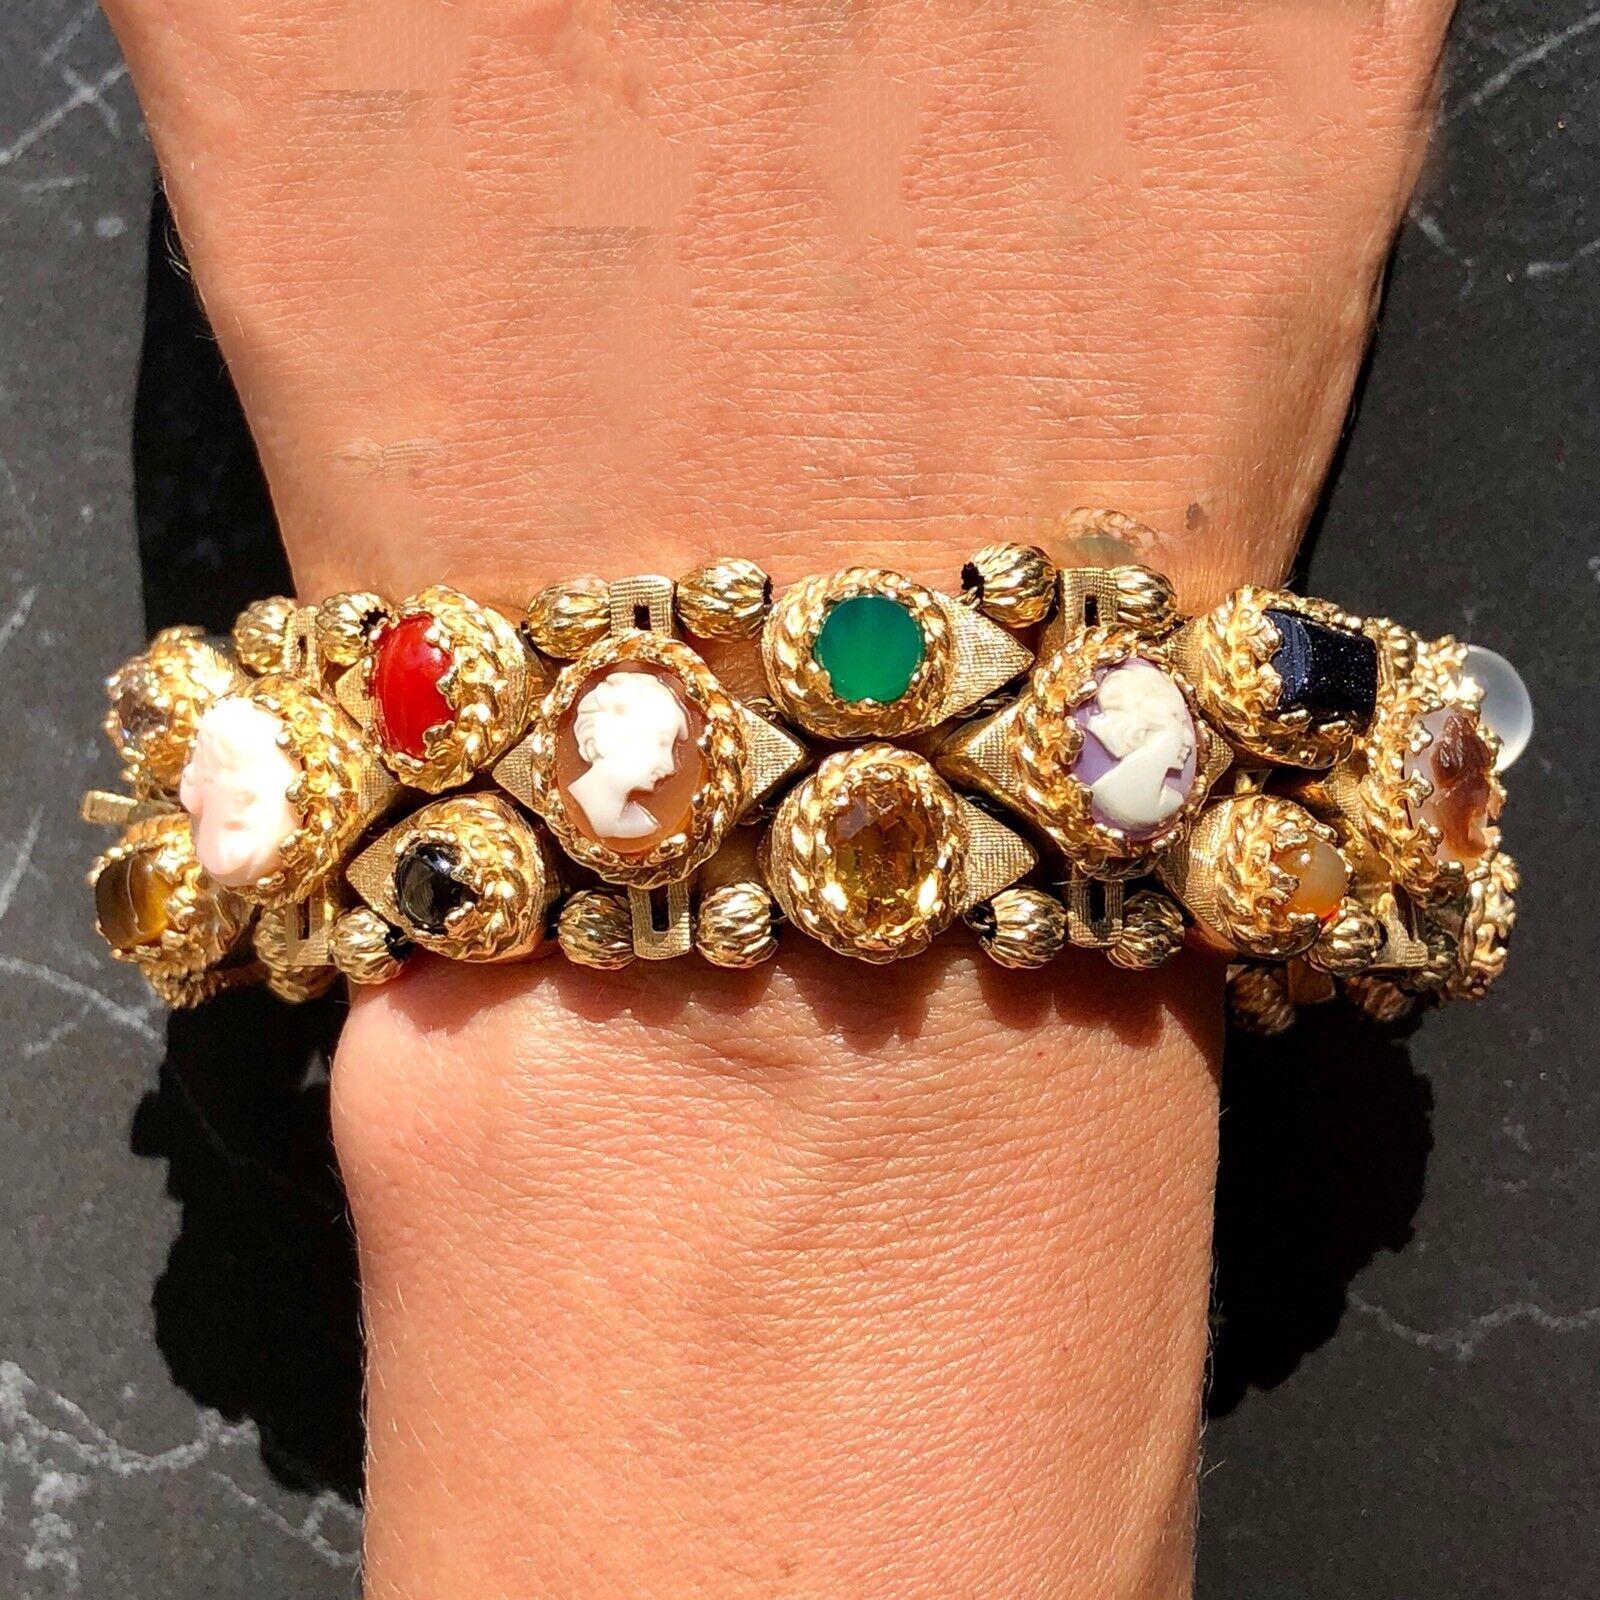 14K Yellow gold Cameo Coral Aqua Turquoise 93g HUGE Handmade Bracelet 8